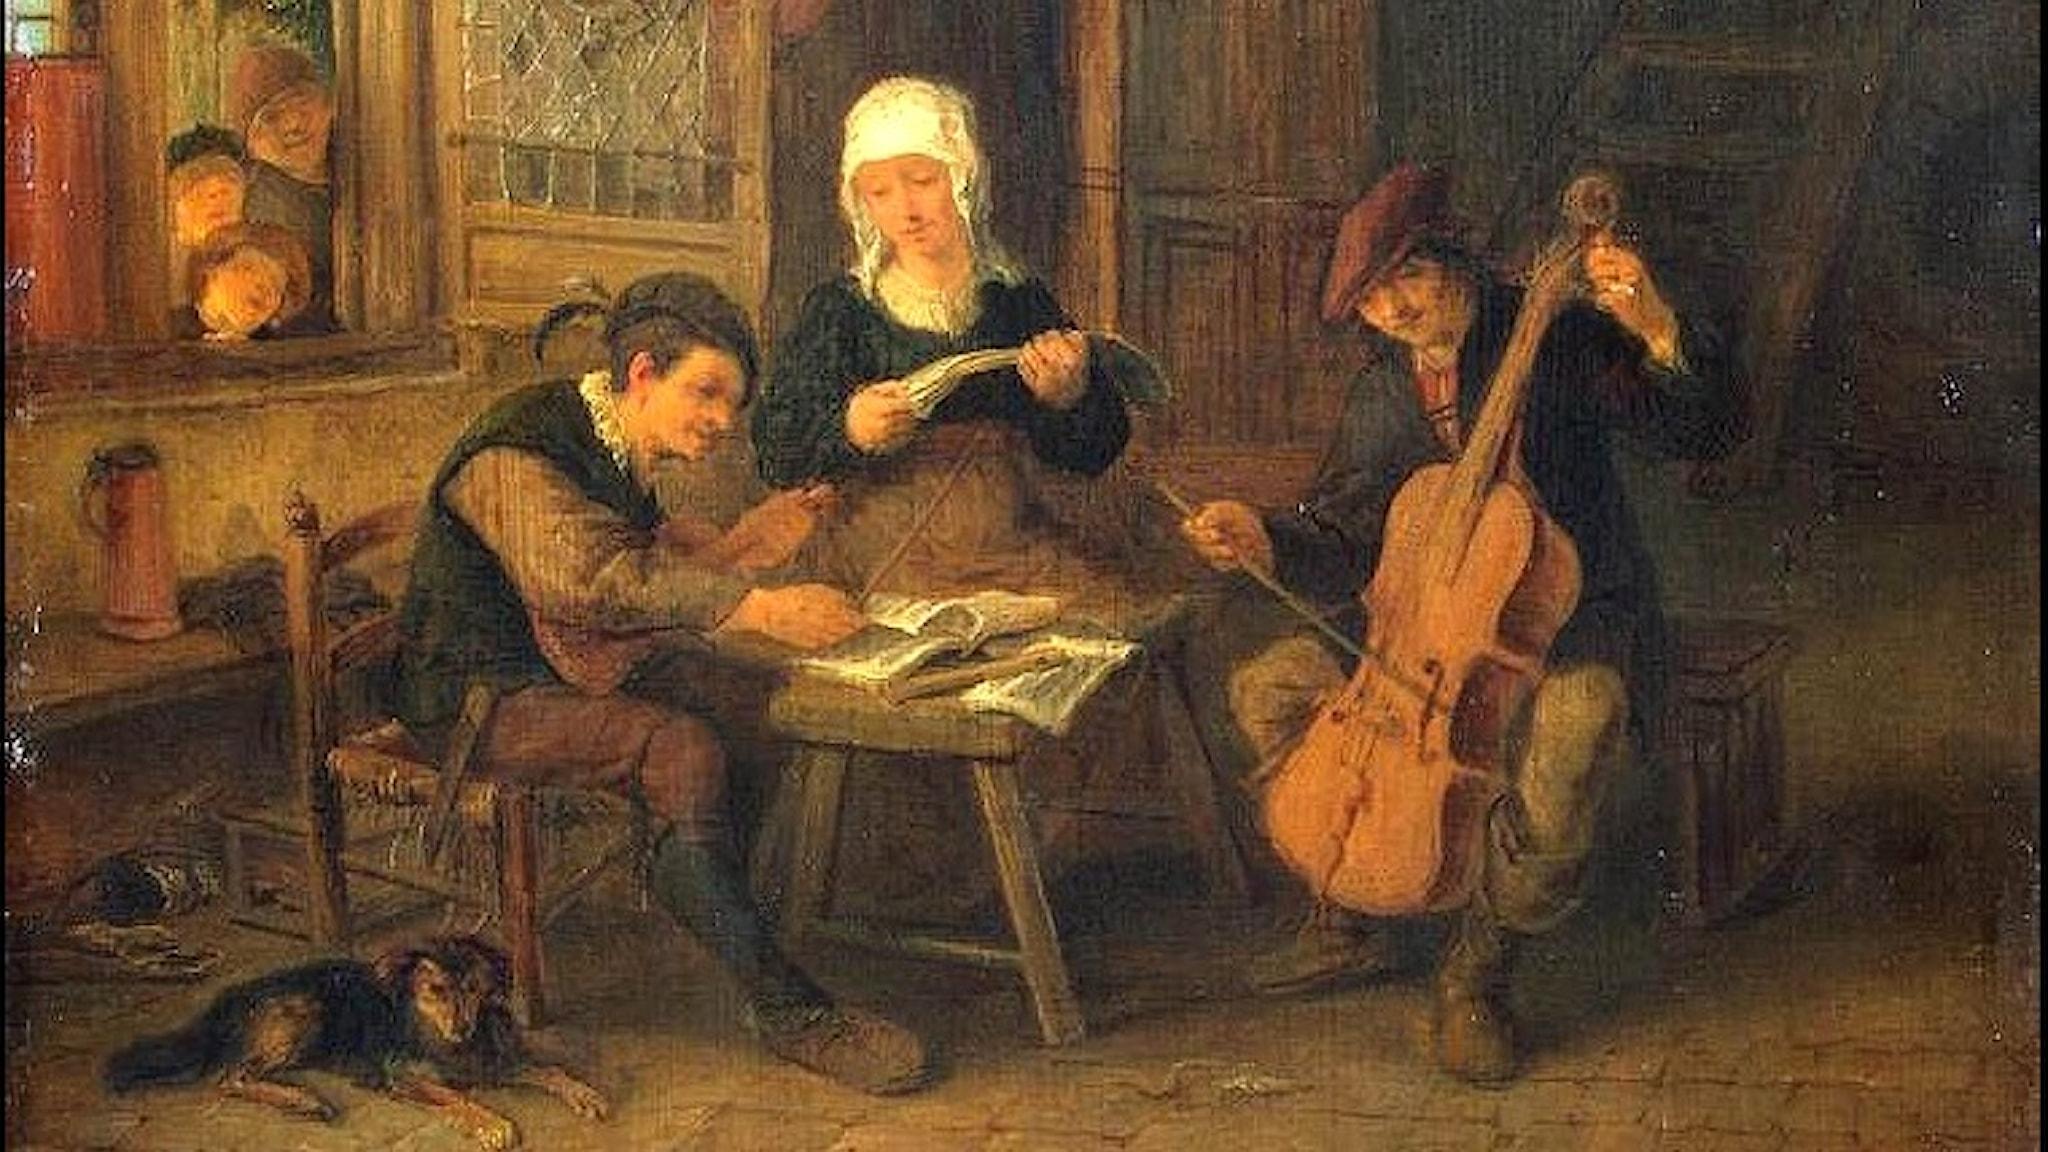 Bymusiker (Adriaen van Ostade, 1655).